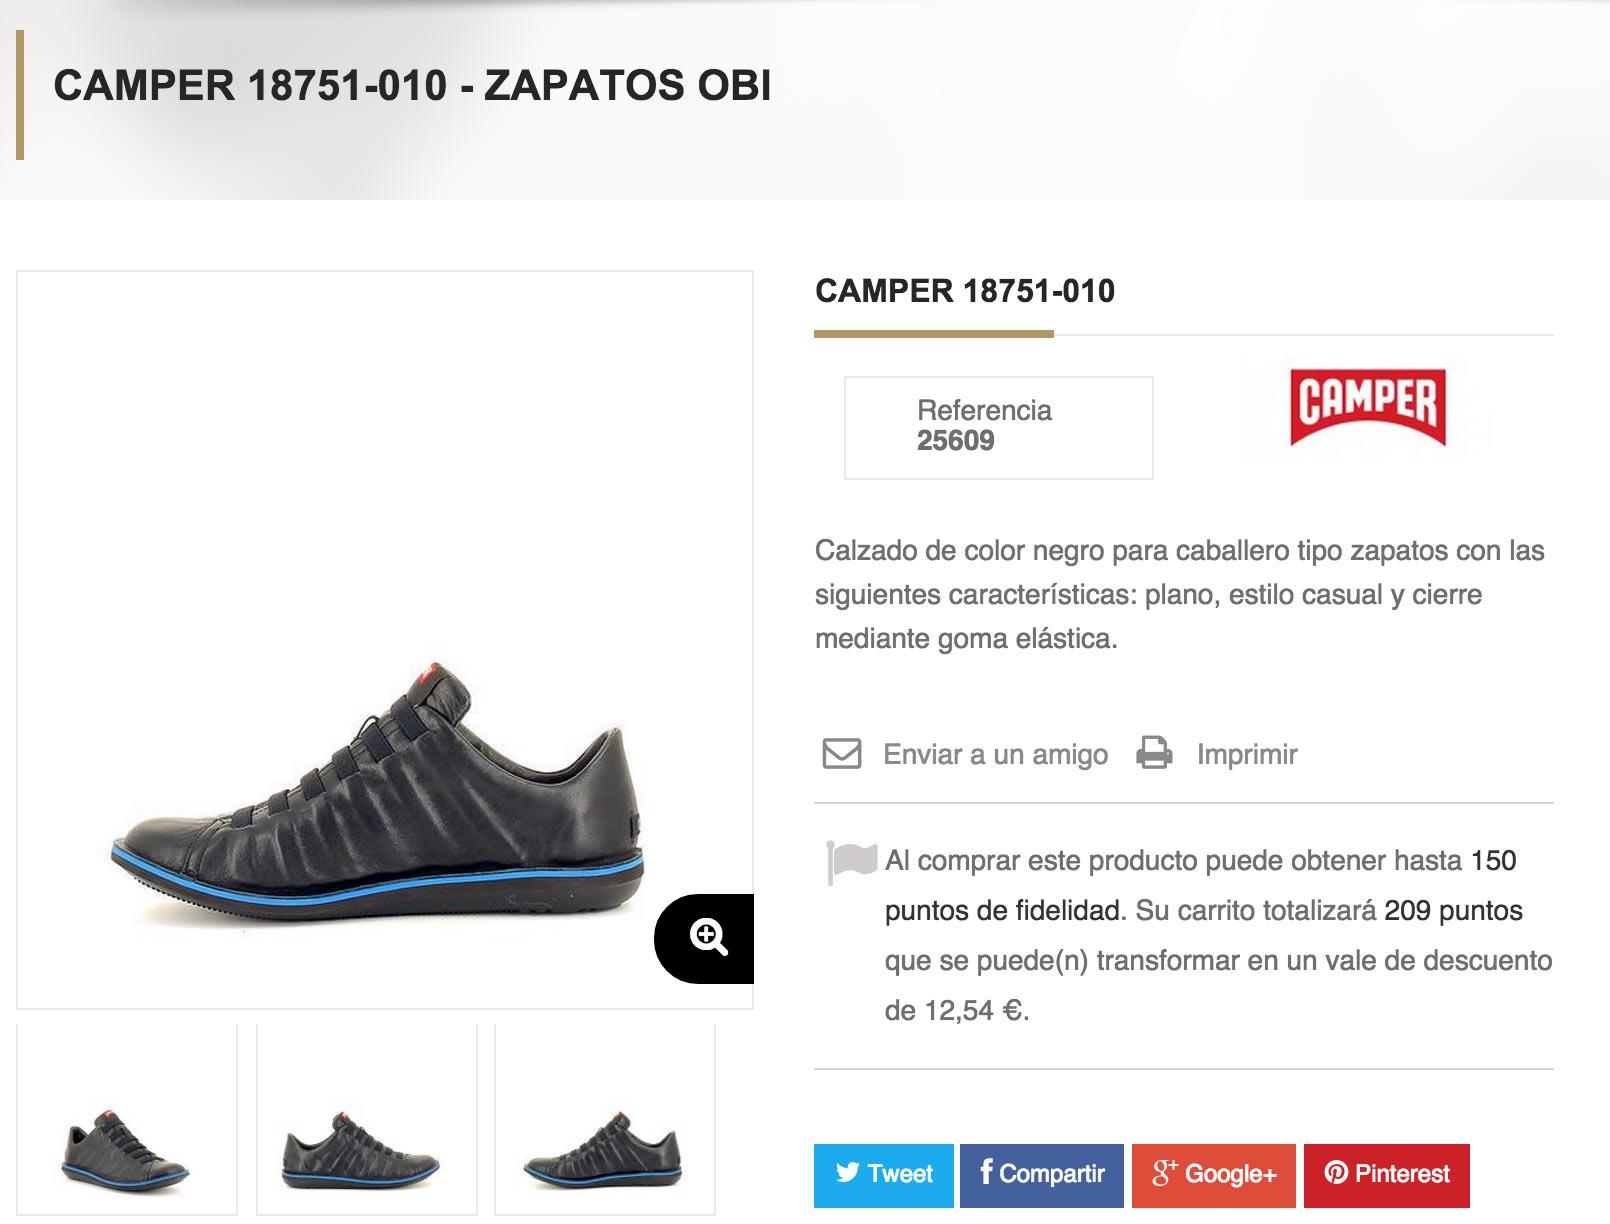 Seo 3 Ecommerce Para Análisis De 0 – Una Zapatos Web Blogger UzVSMp